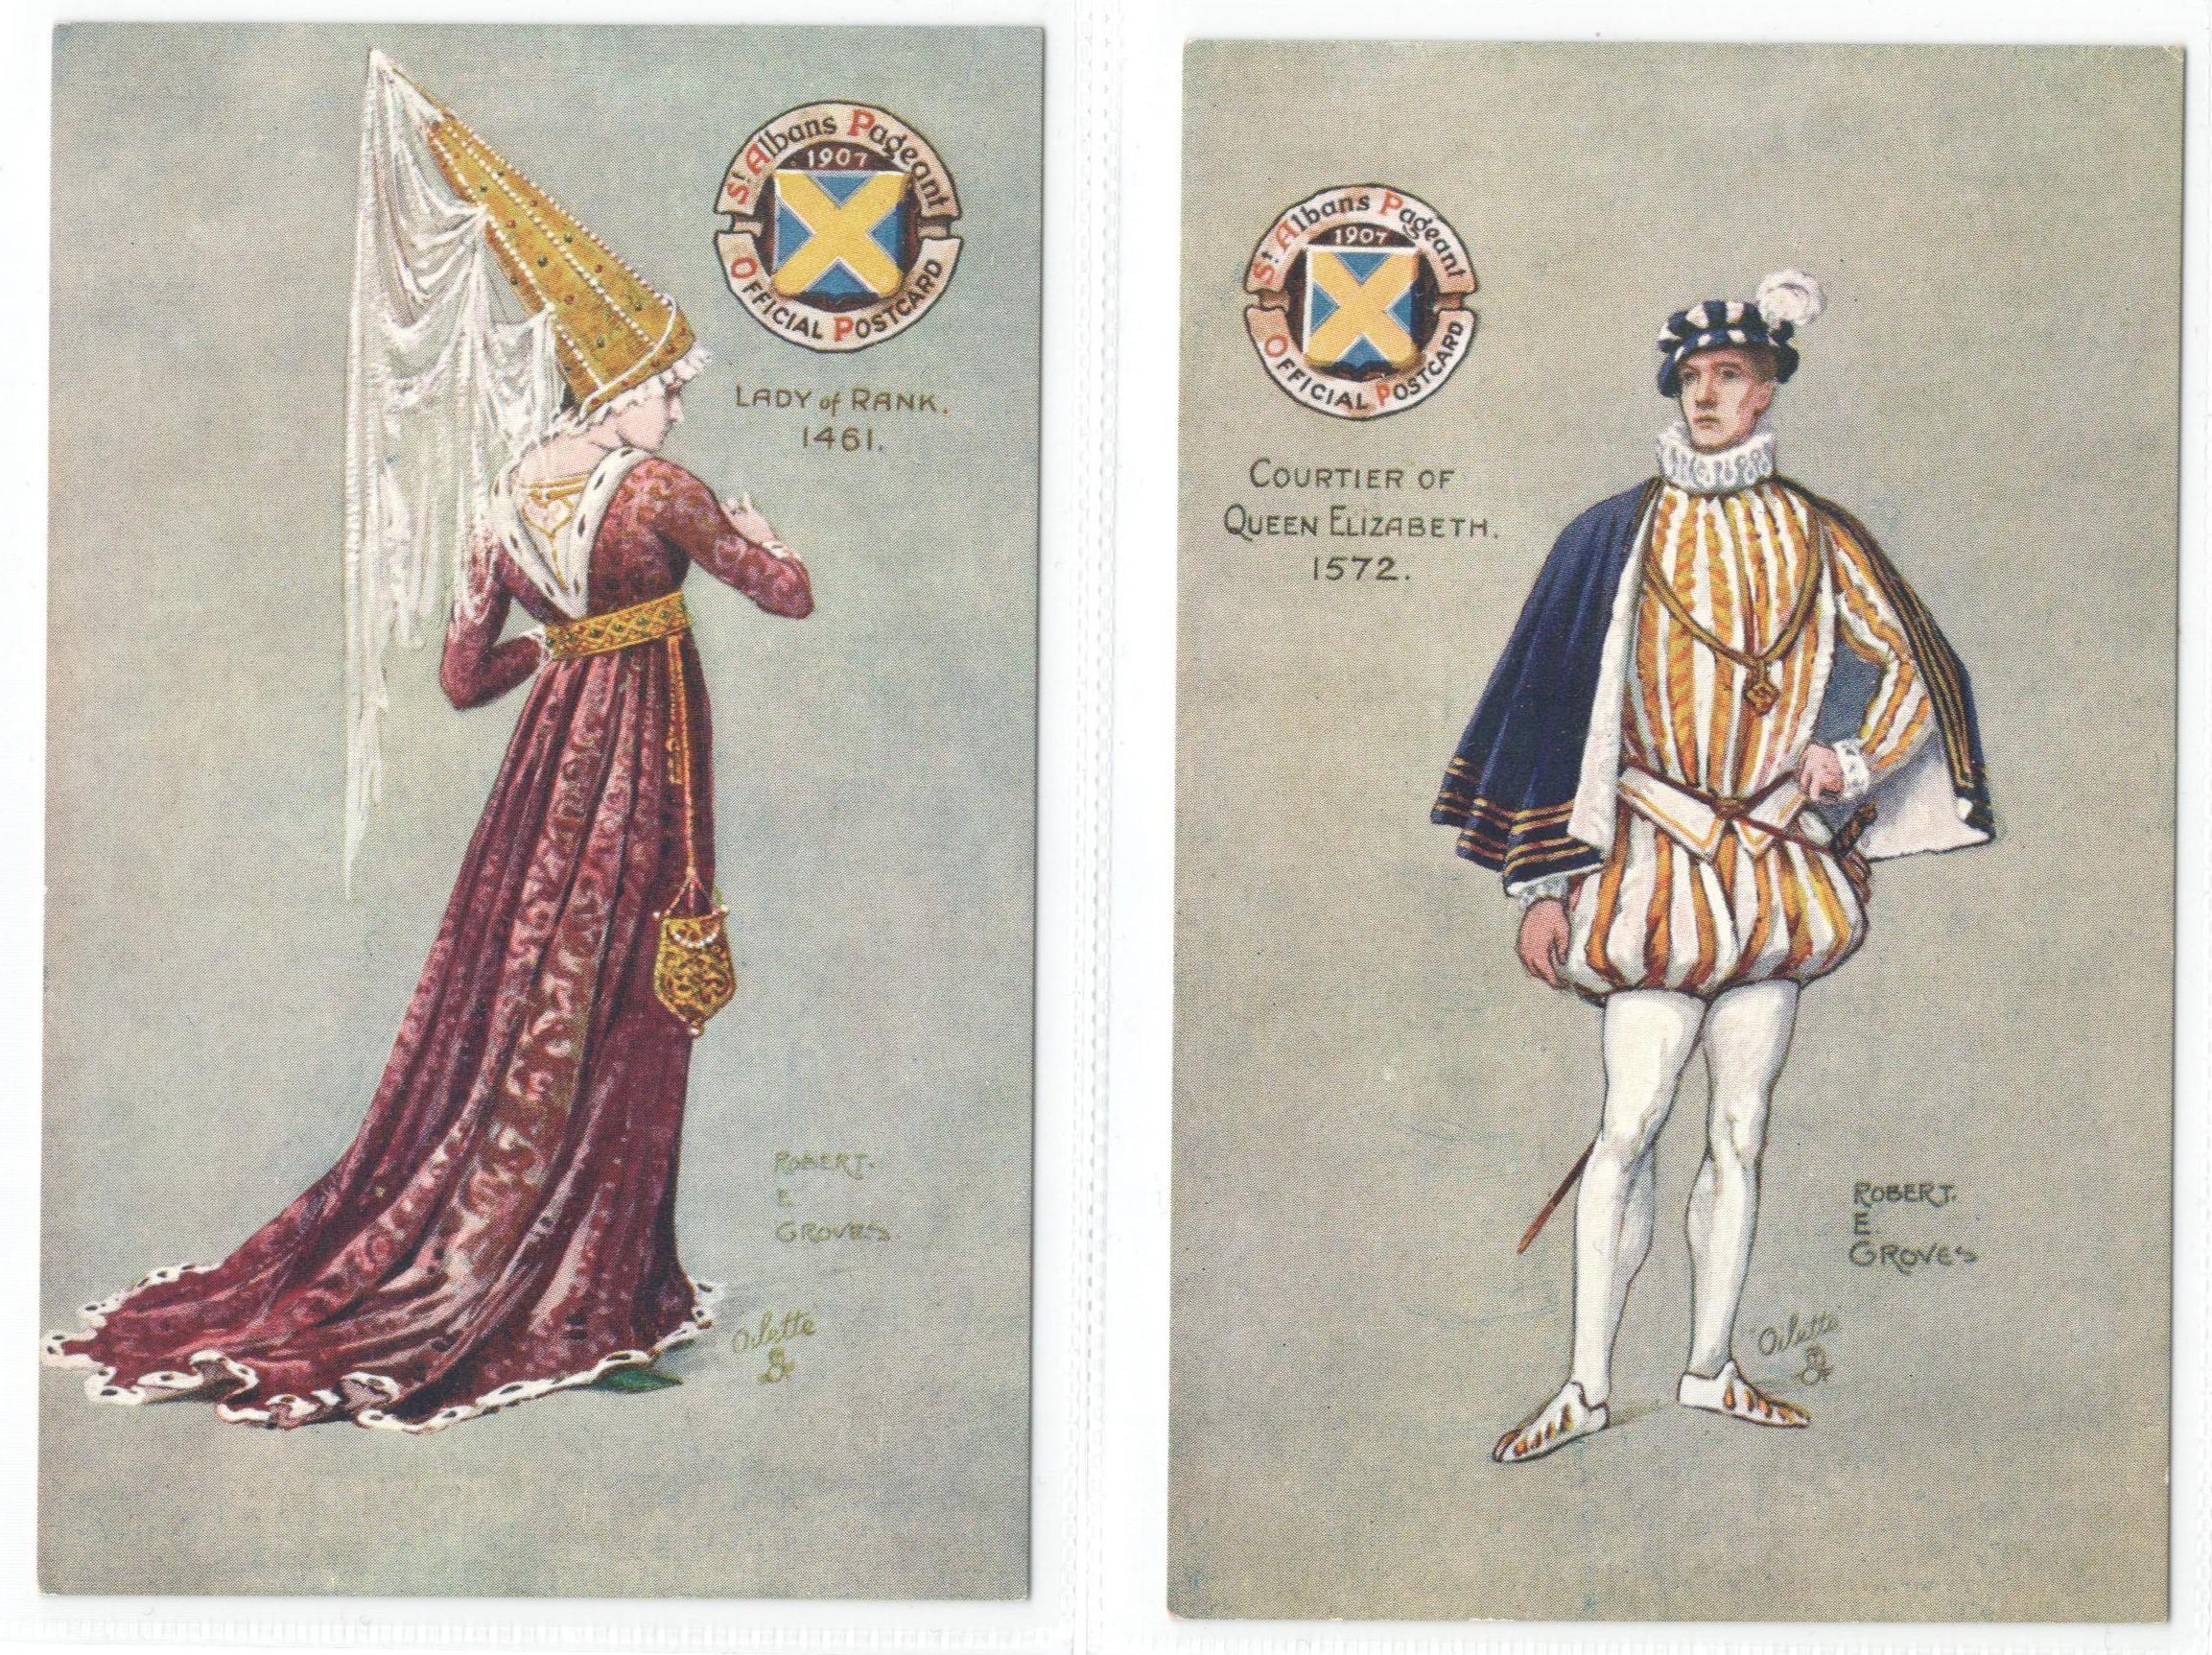 ST ALBANS PAGEANTS SERIES I, II & III - SIX RAPHAEL TUCK POSTCARDS - Image 5 of 6